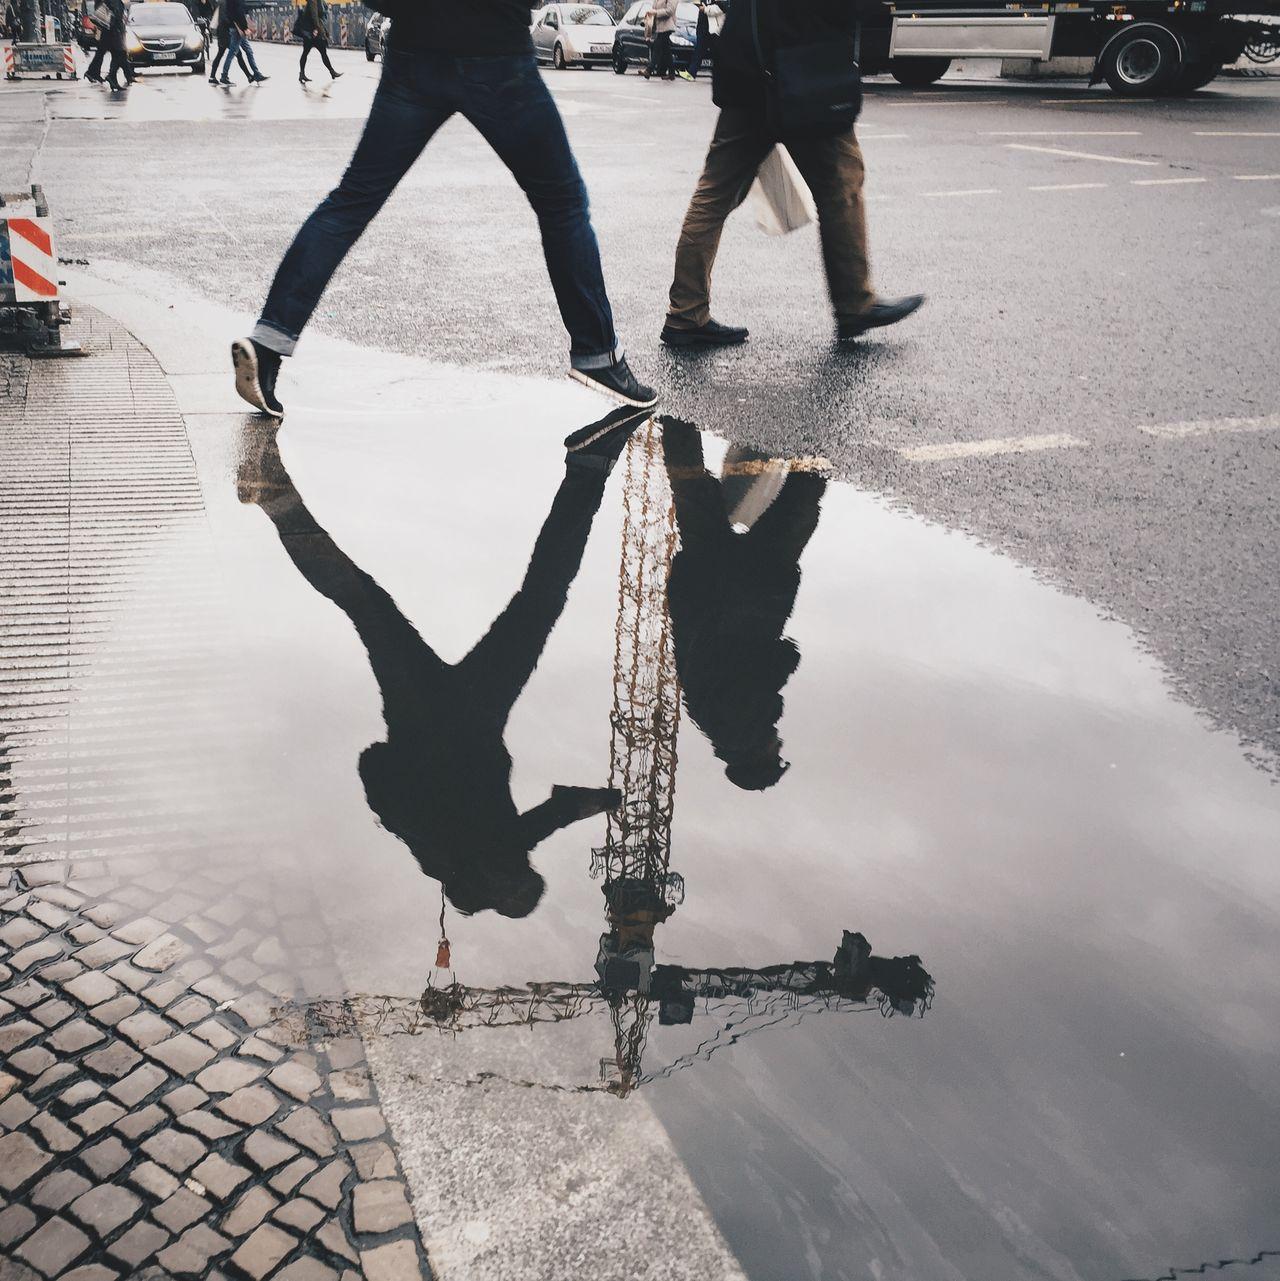 Henri Cartier Bresson meets Berlin street life Berlin City Life Day Go To Work Human Foot Leisure Activity Lifestyles Low Section Men Mirror Morning Outdoors Person Rain Road Shoe Sidewalk Standing Street Streetphotography Urban Walking Wet Wetter Work